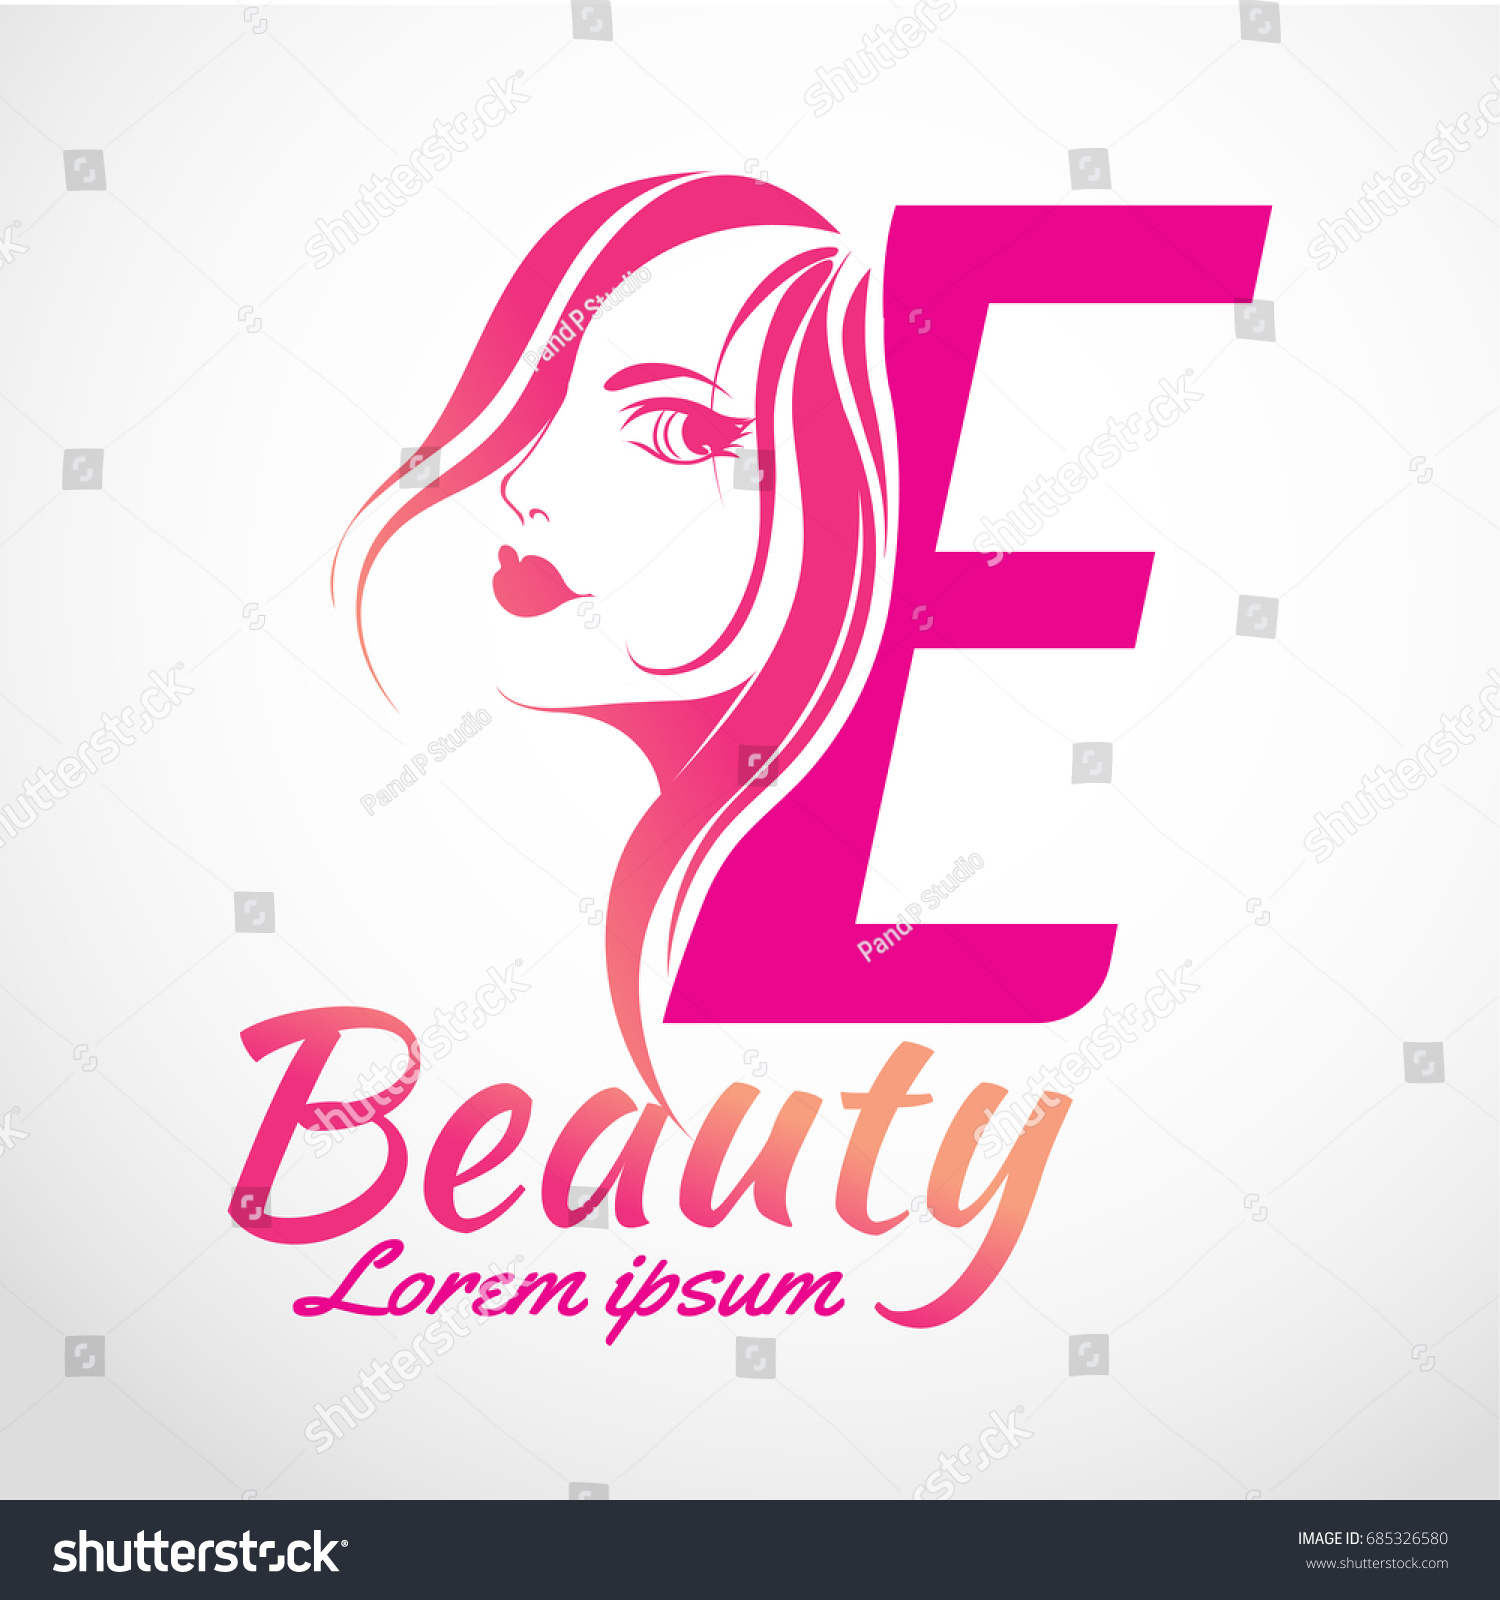 Abstract Letter E Logo Beauty Salon Stock Vector (Royalty Free ...